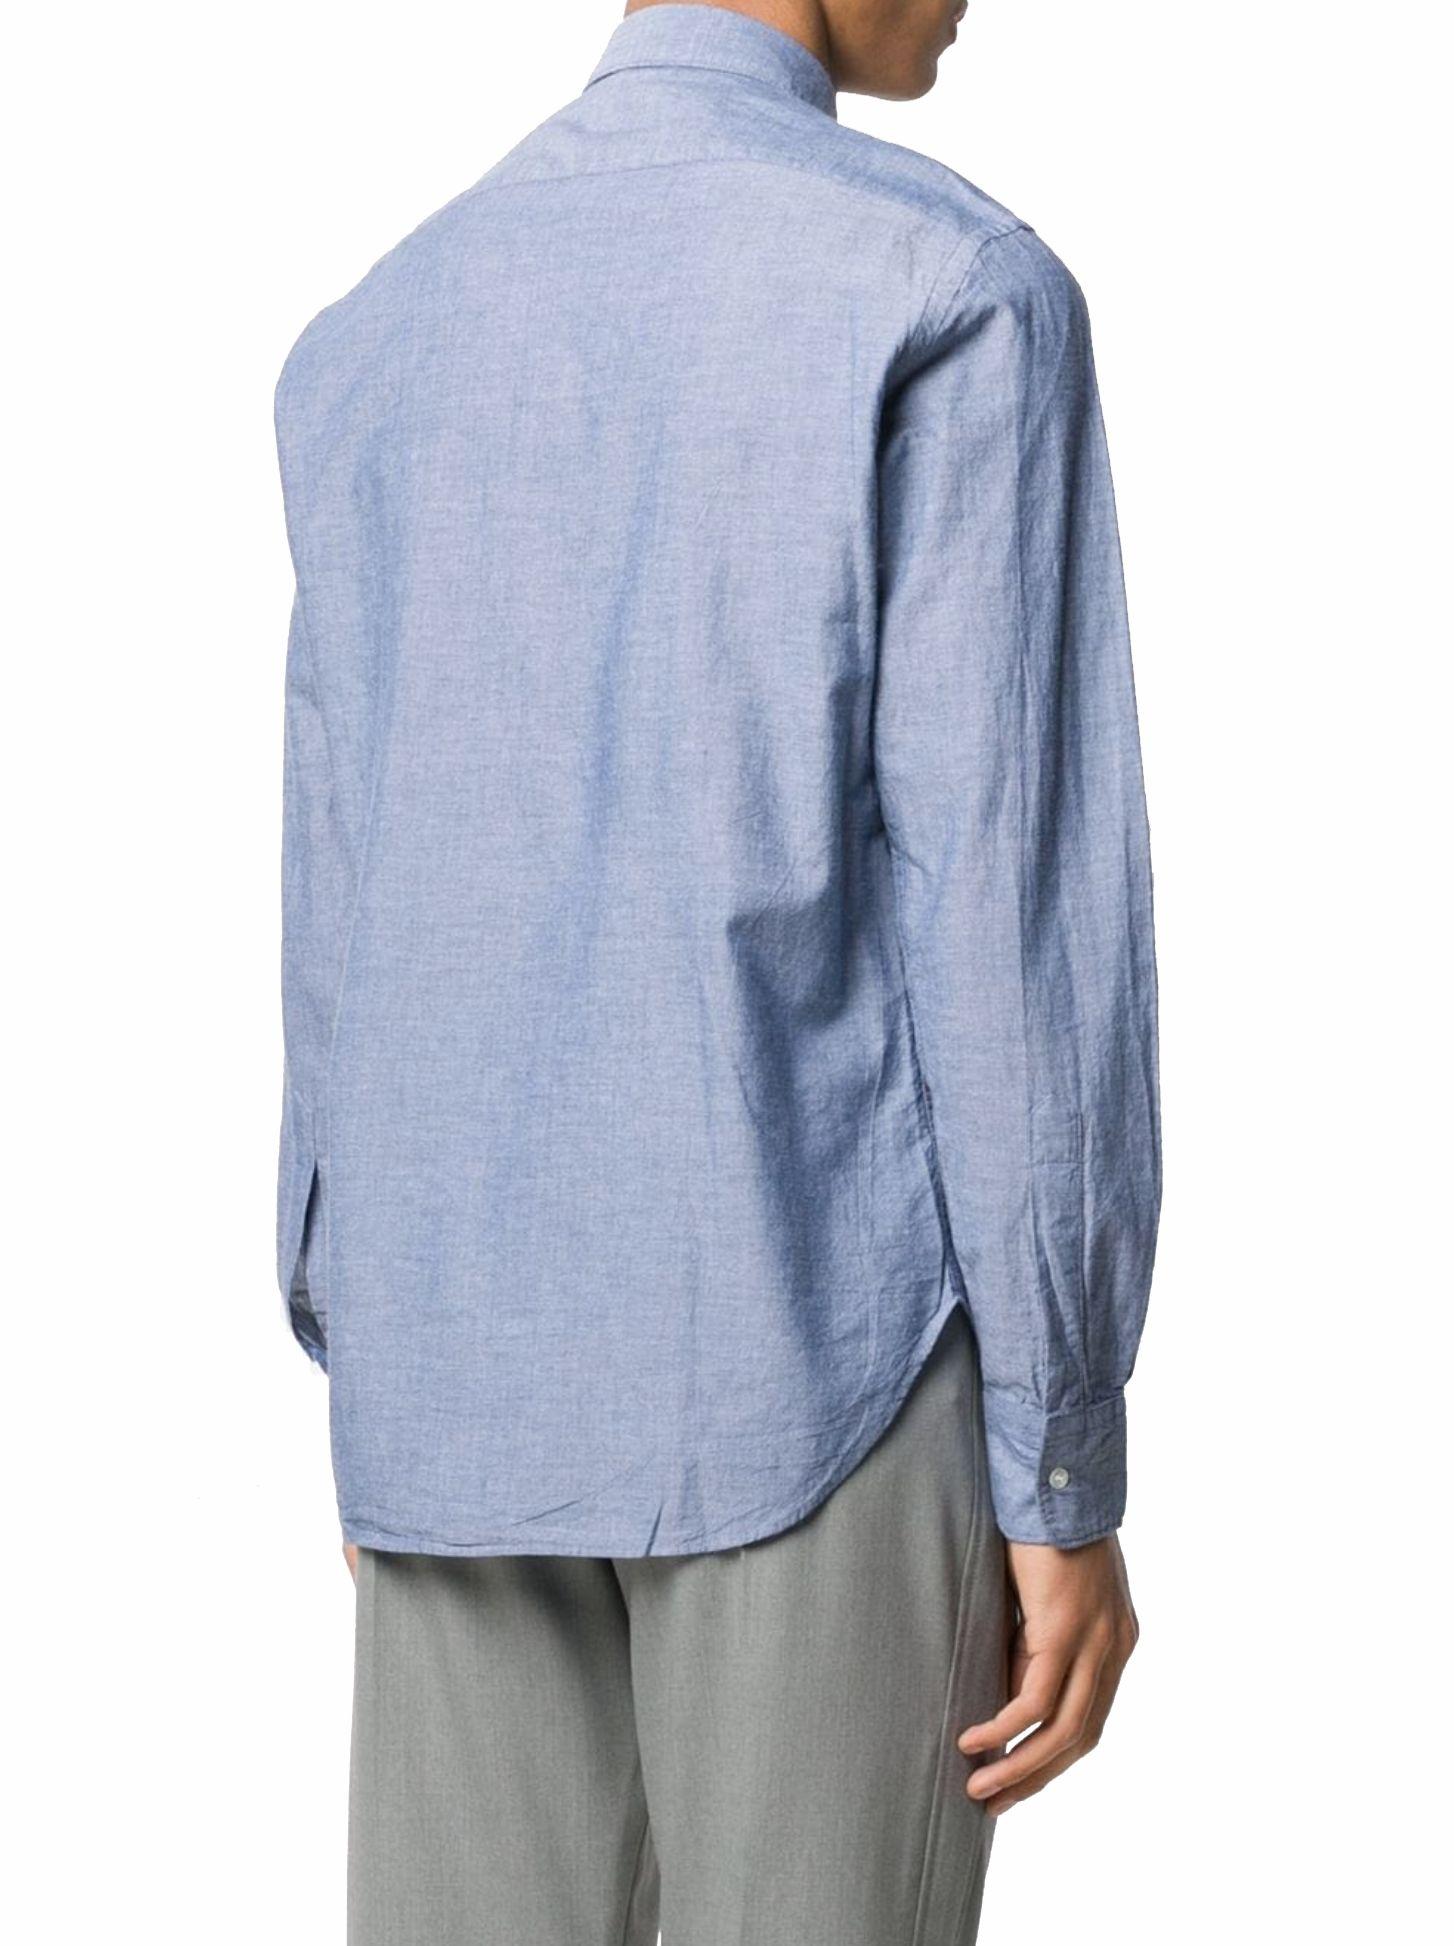 ASPESI Cottons ASPESI MEN'S BLUE COTTON SHIRT